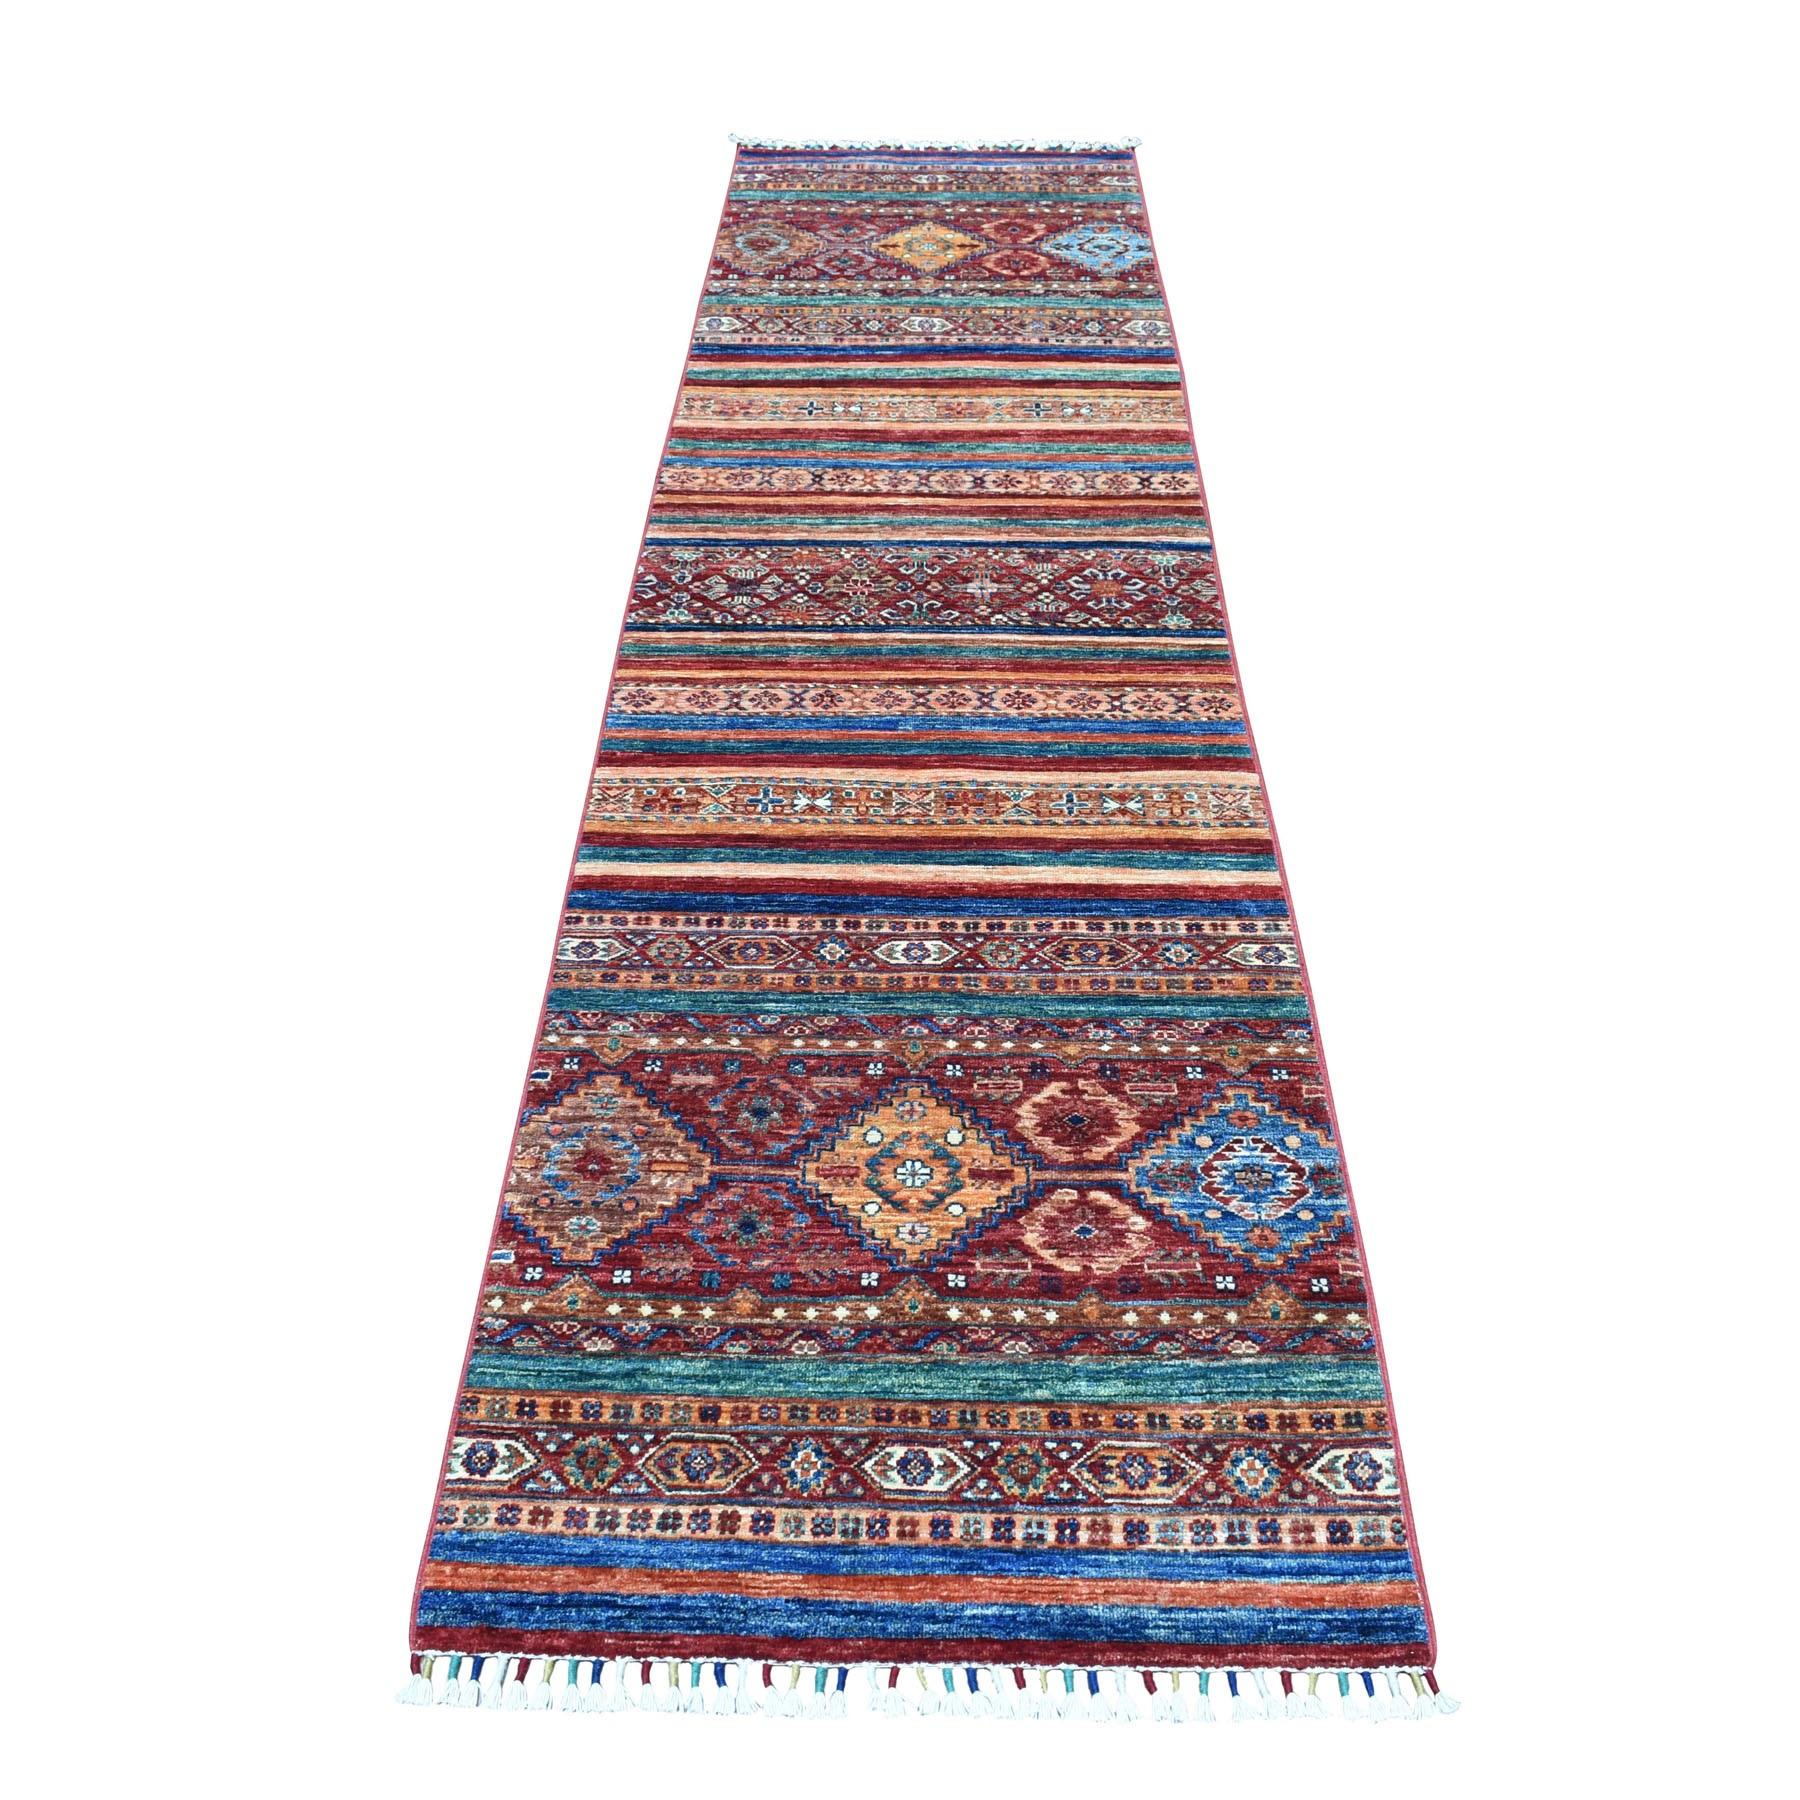 "2'7""x10'2"" Khorjin Design Colorful Super Kazak Pure Wool Runner  Hand Knotted Oriental Rug"